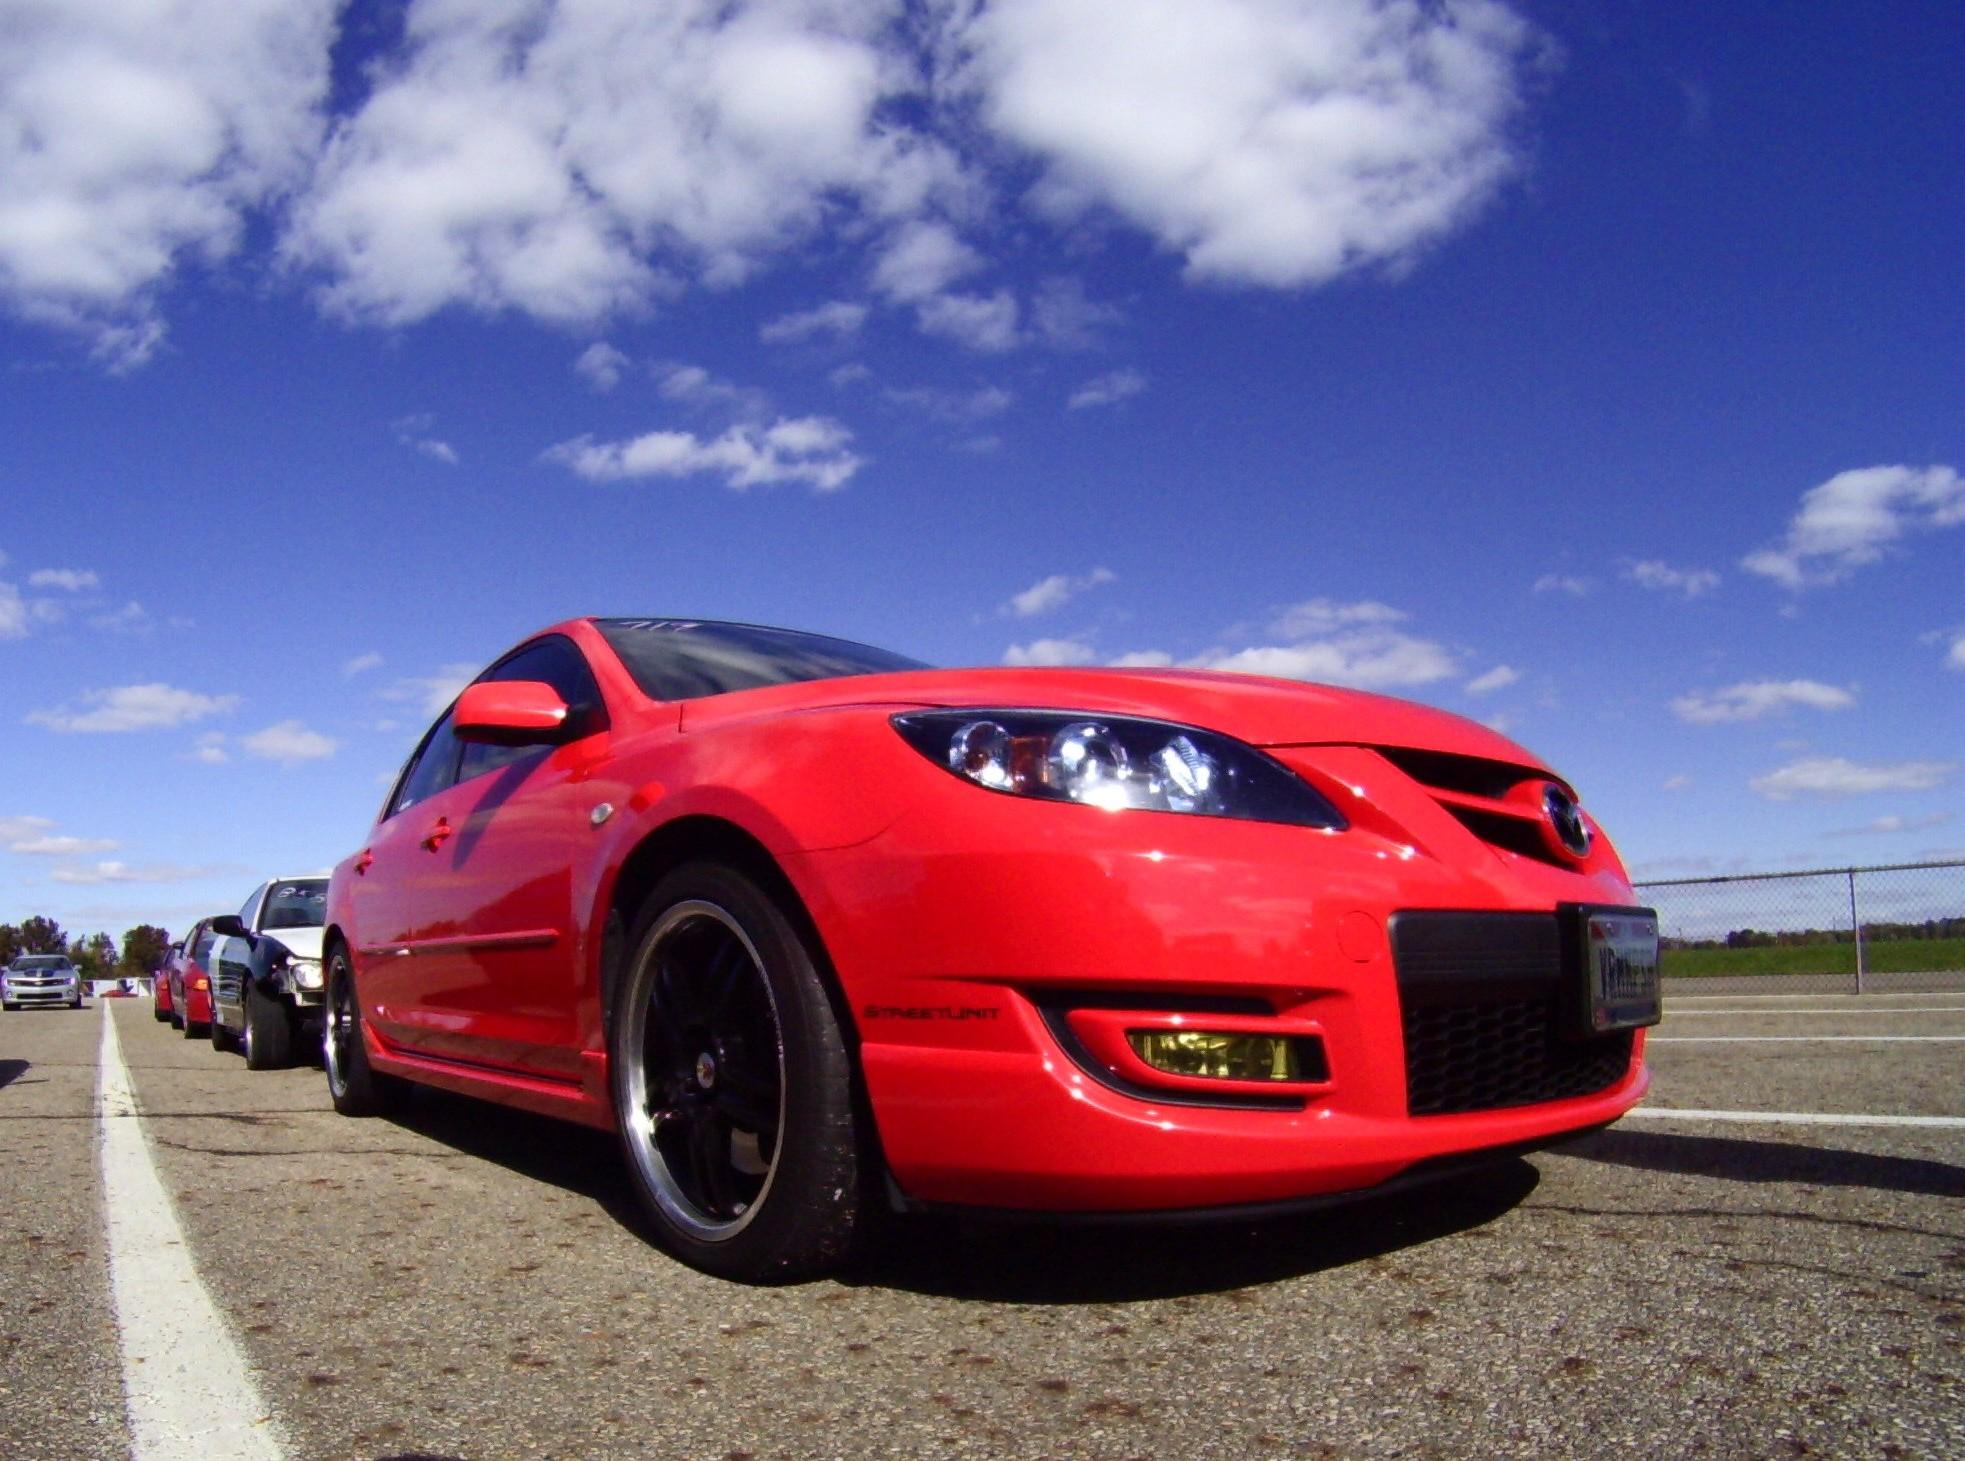 2007 Mazda 3 Sd 3 1/4 mile trap sds 0-60 - DragTimes.com